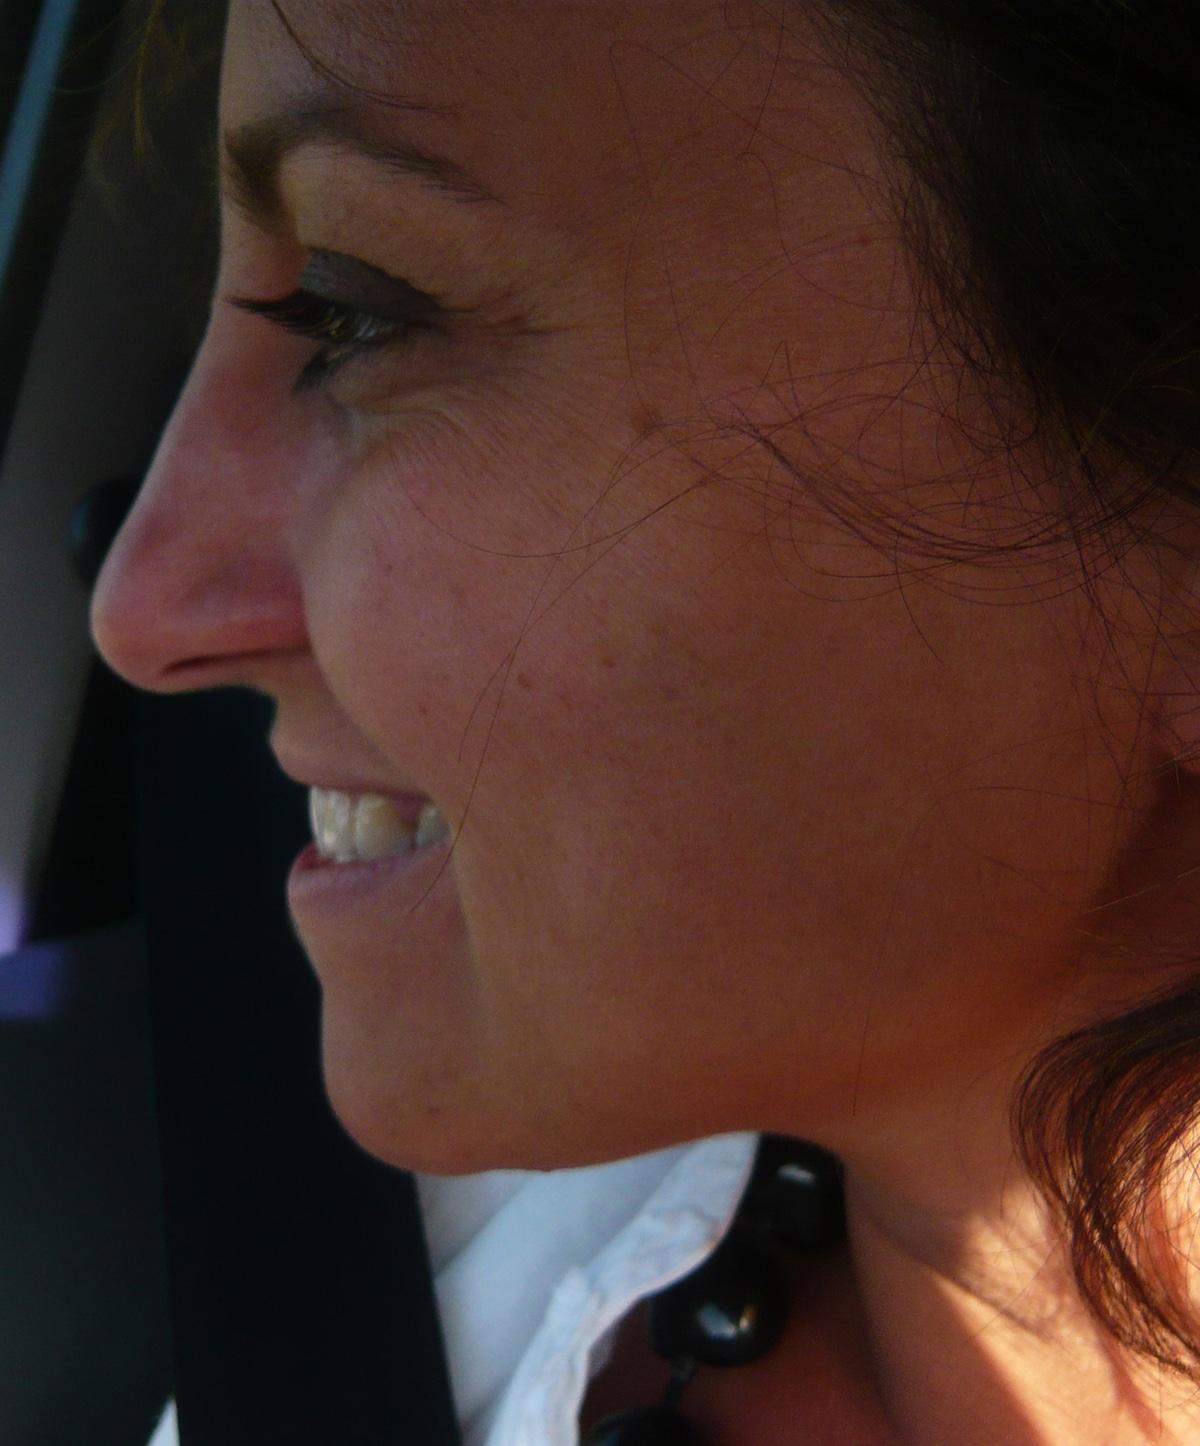 Laura from Sinalunga